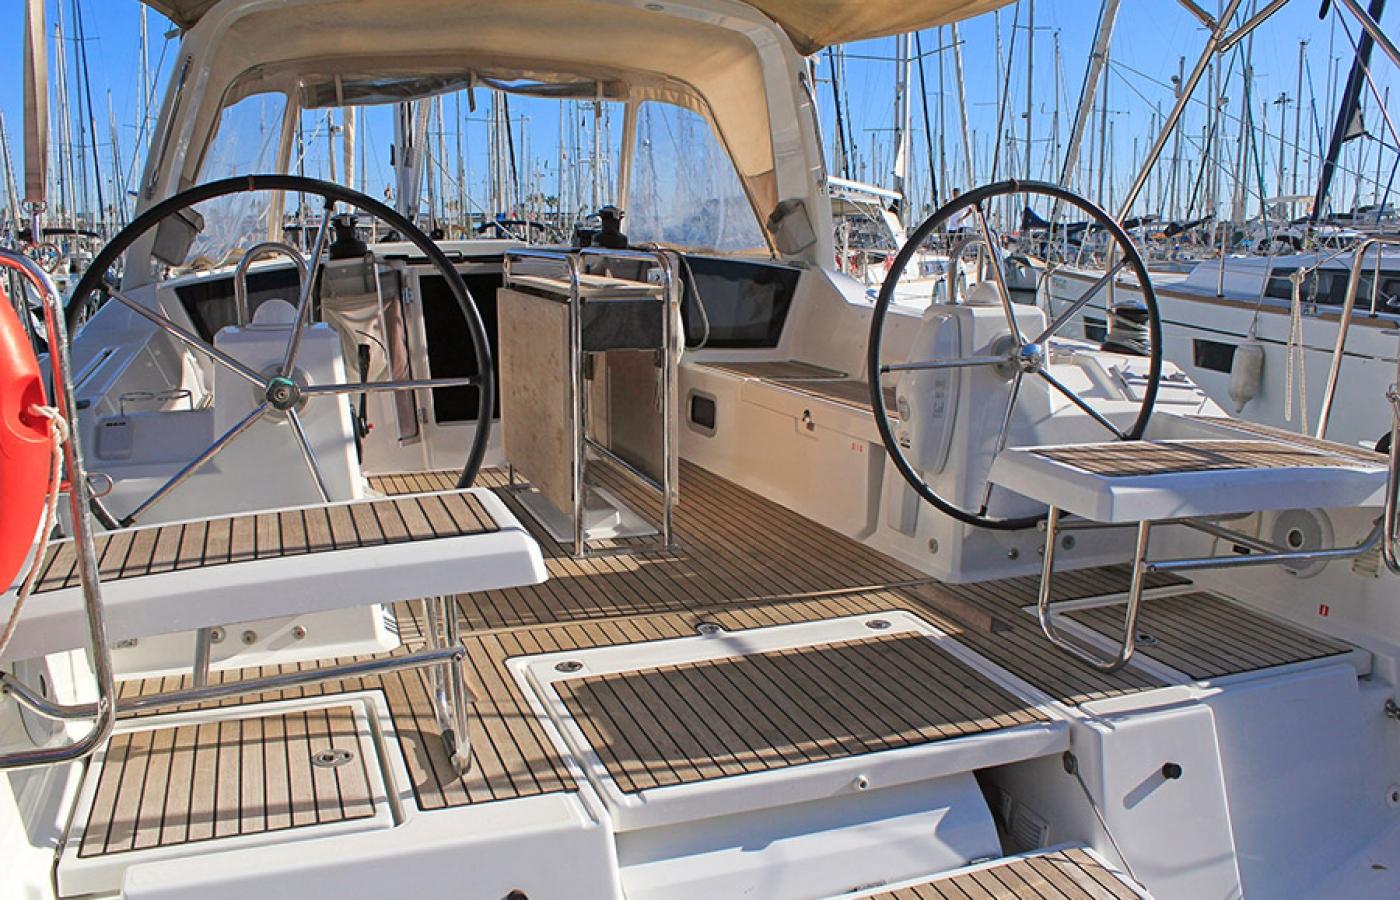 Two steering wheels on the Beneteau Oceanis 41.1. - FUGIS to port and starboard